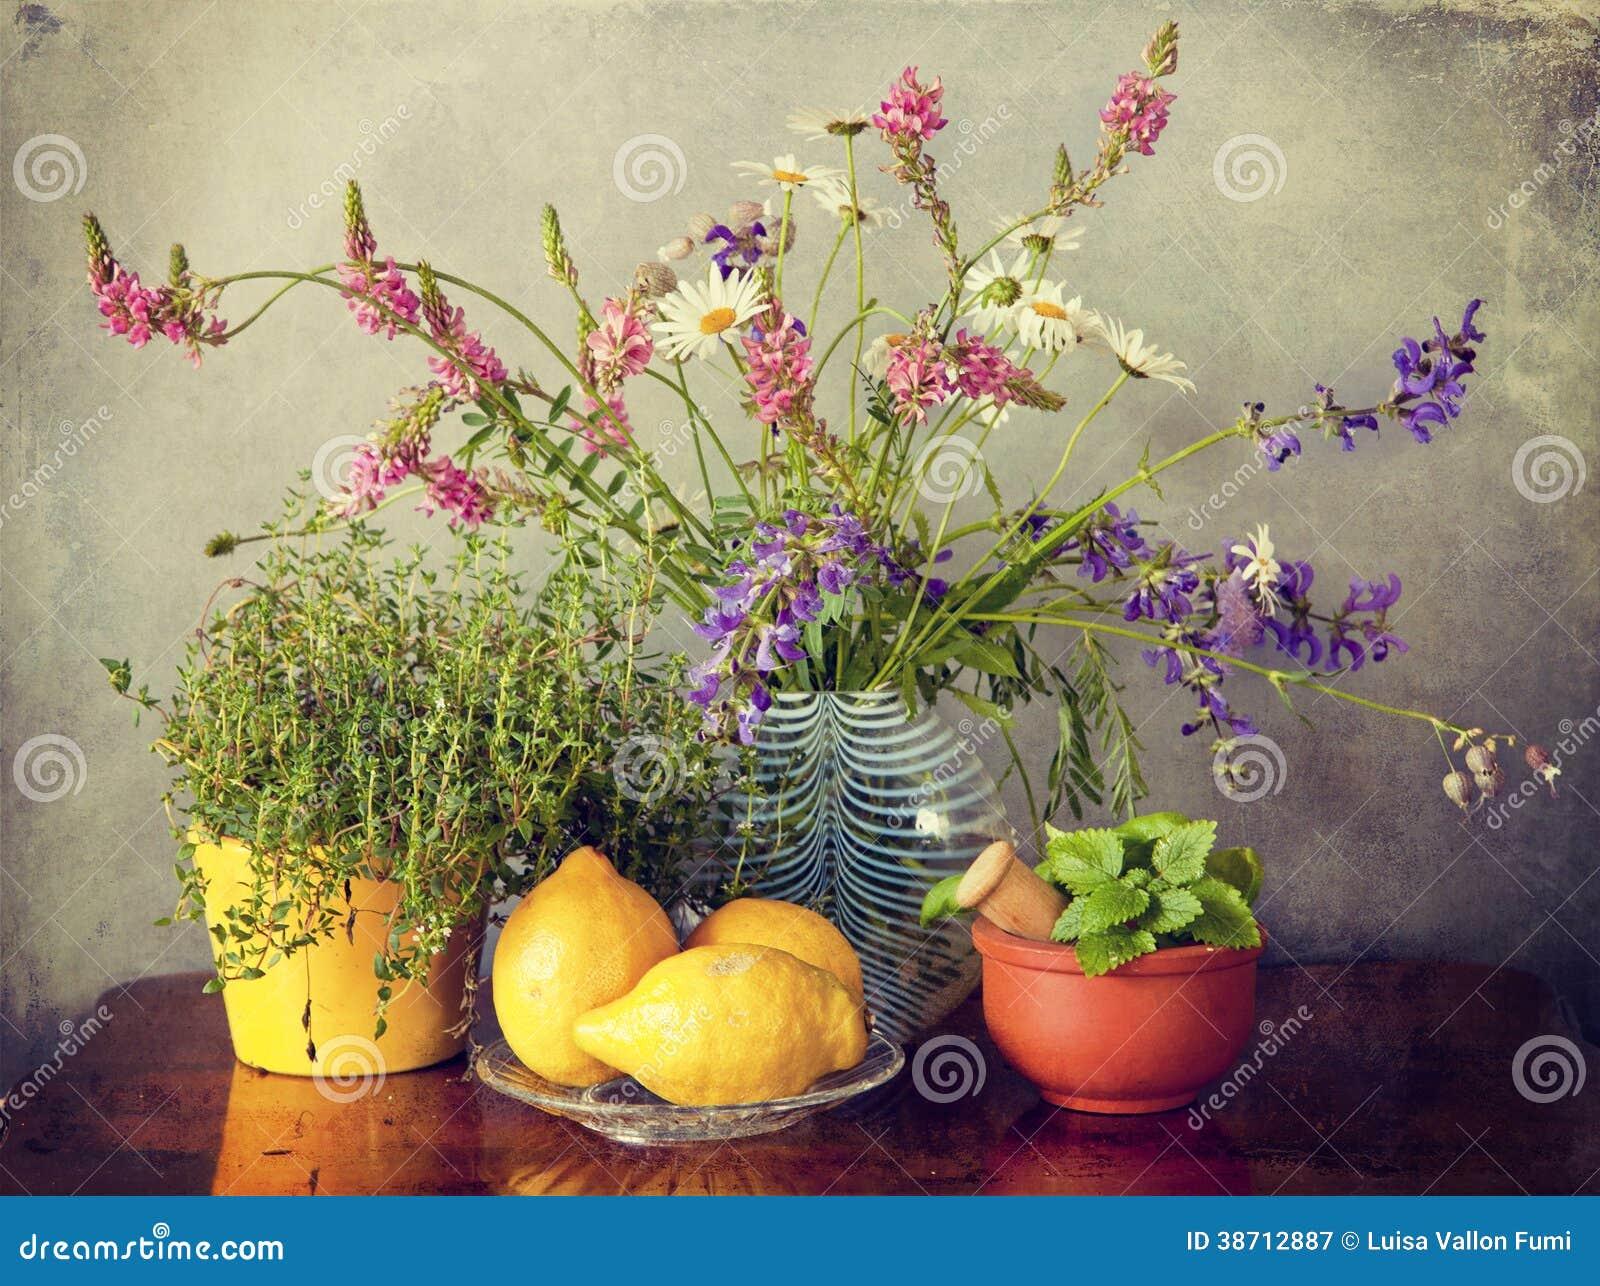 Wild Flowers In Vase, Herbs And Lemon Fruits Royalty Free